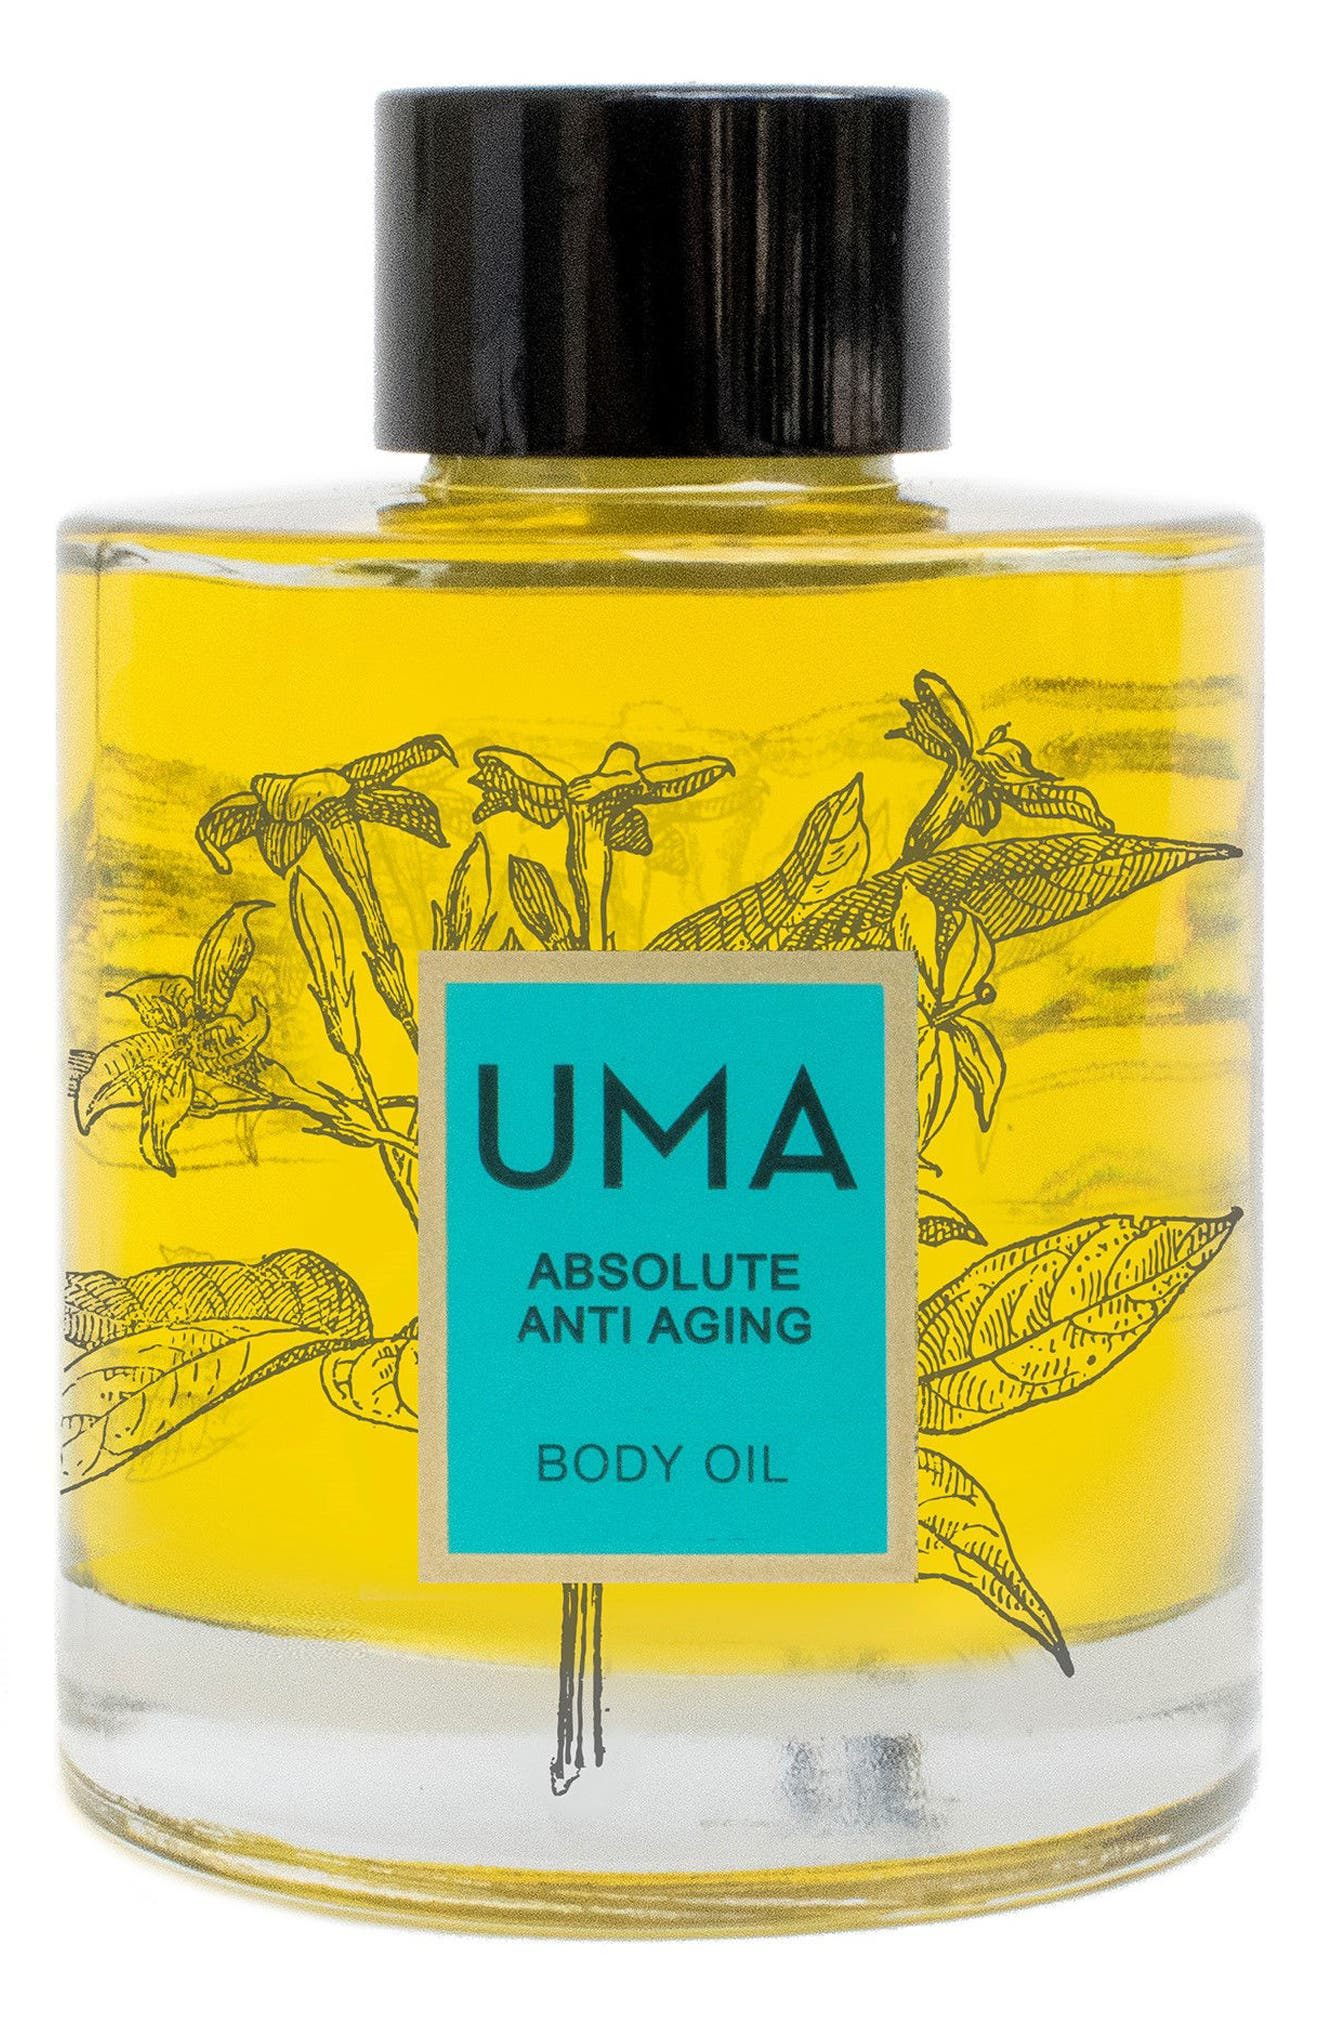 Uma ABSOLUTE ANTI-AGING BODY OIL